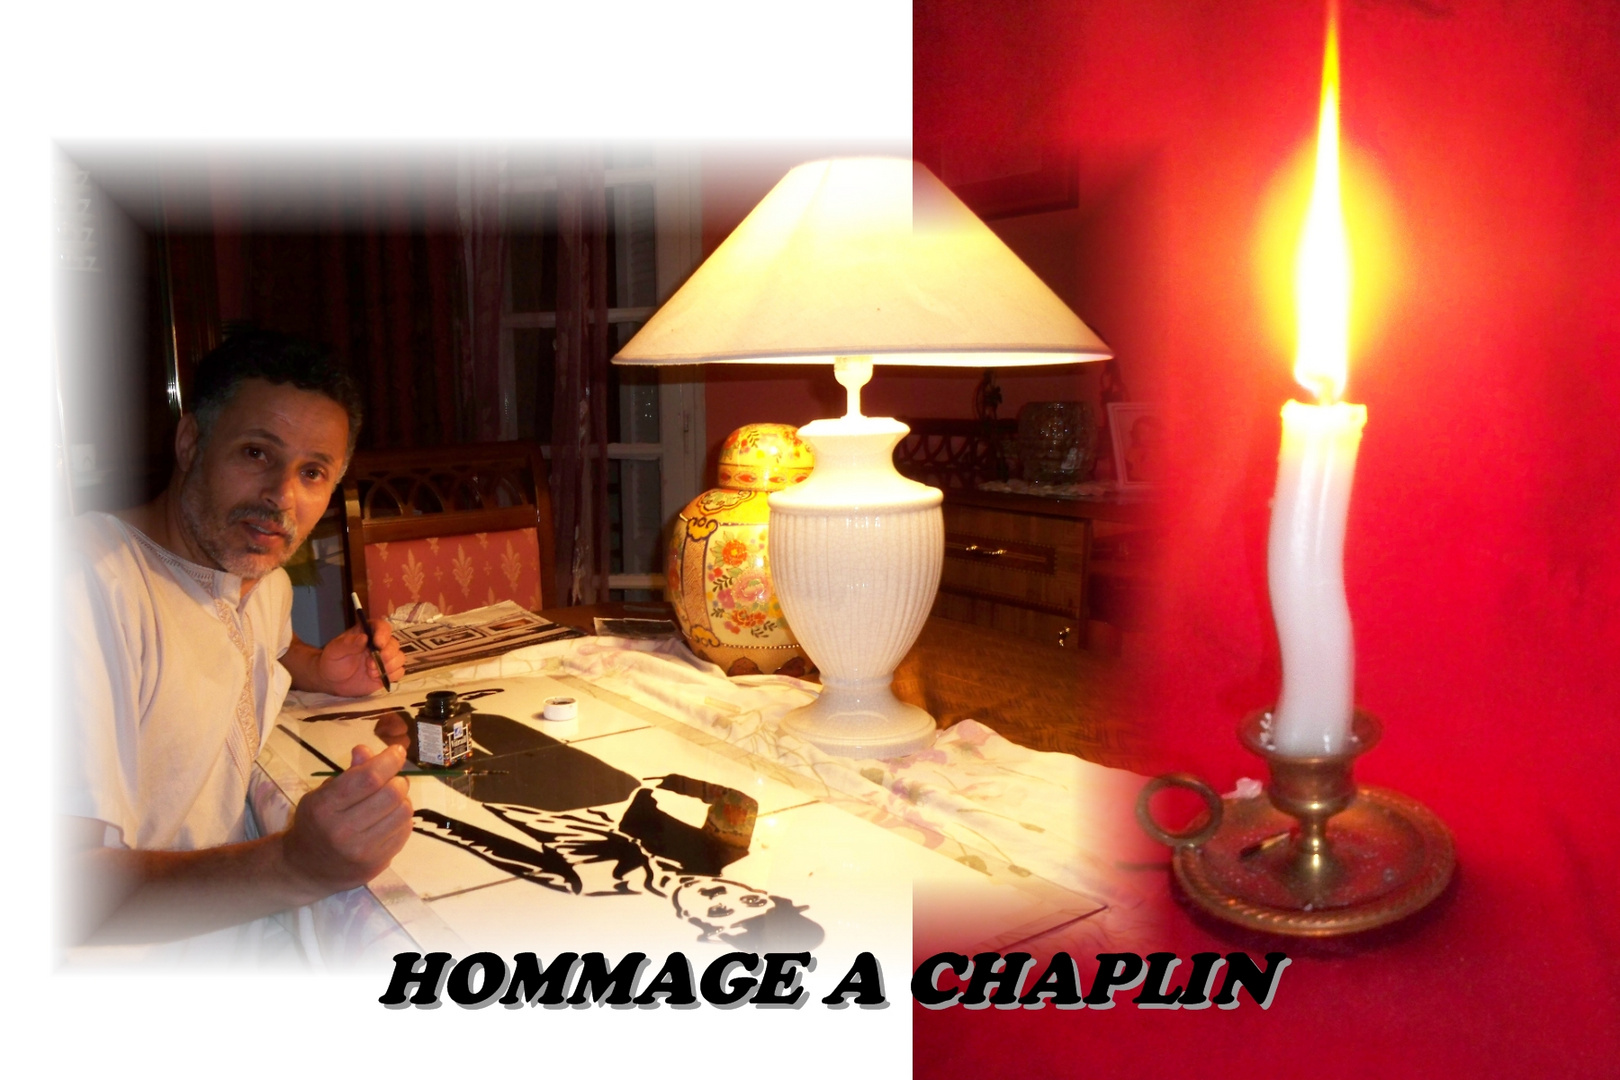 HOMMAGE A CHAPLIN